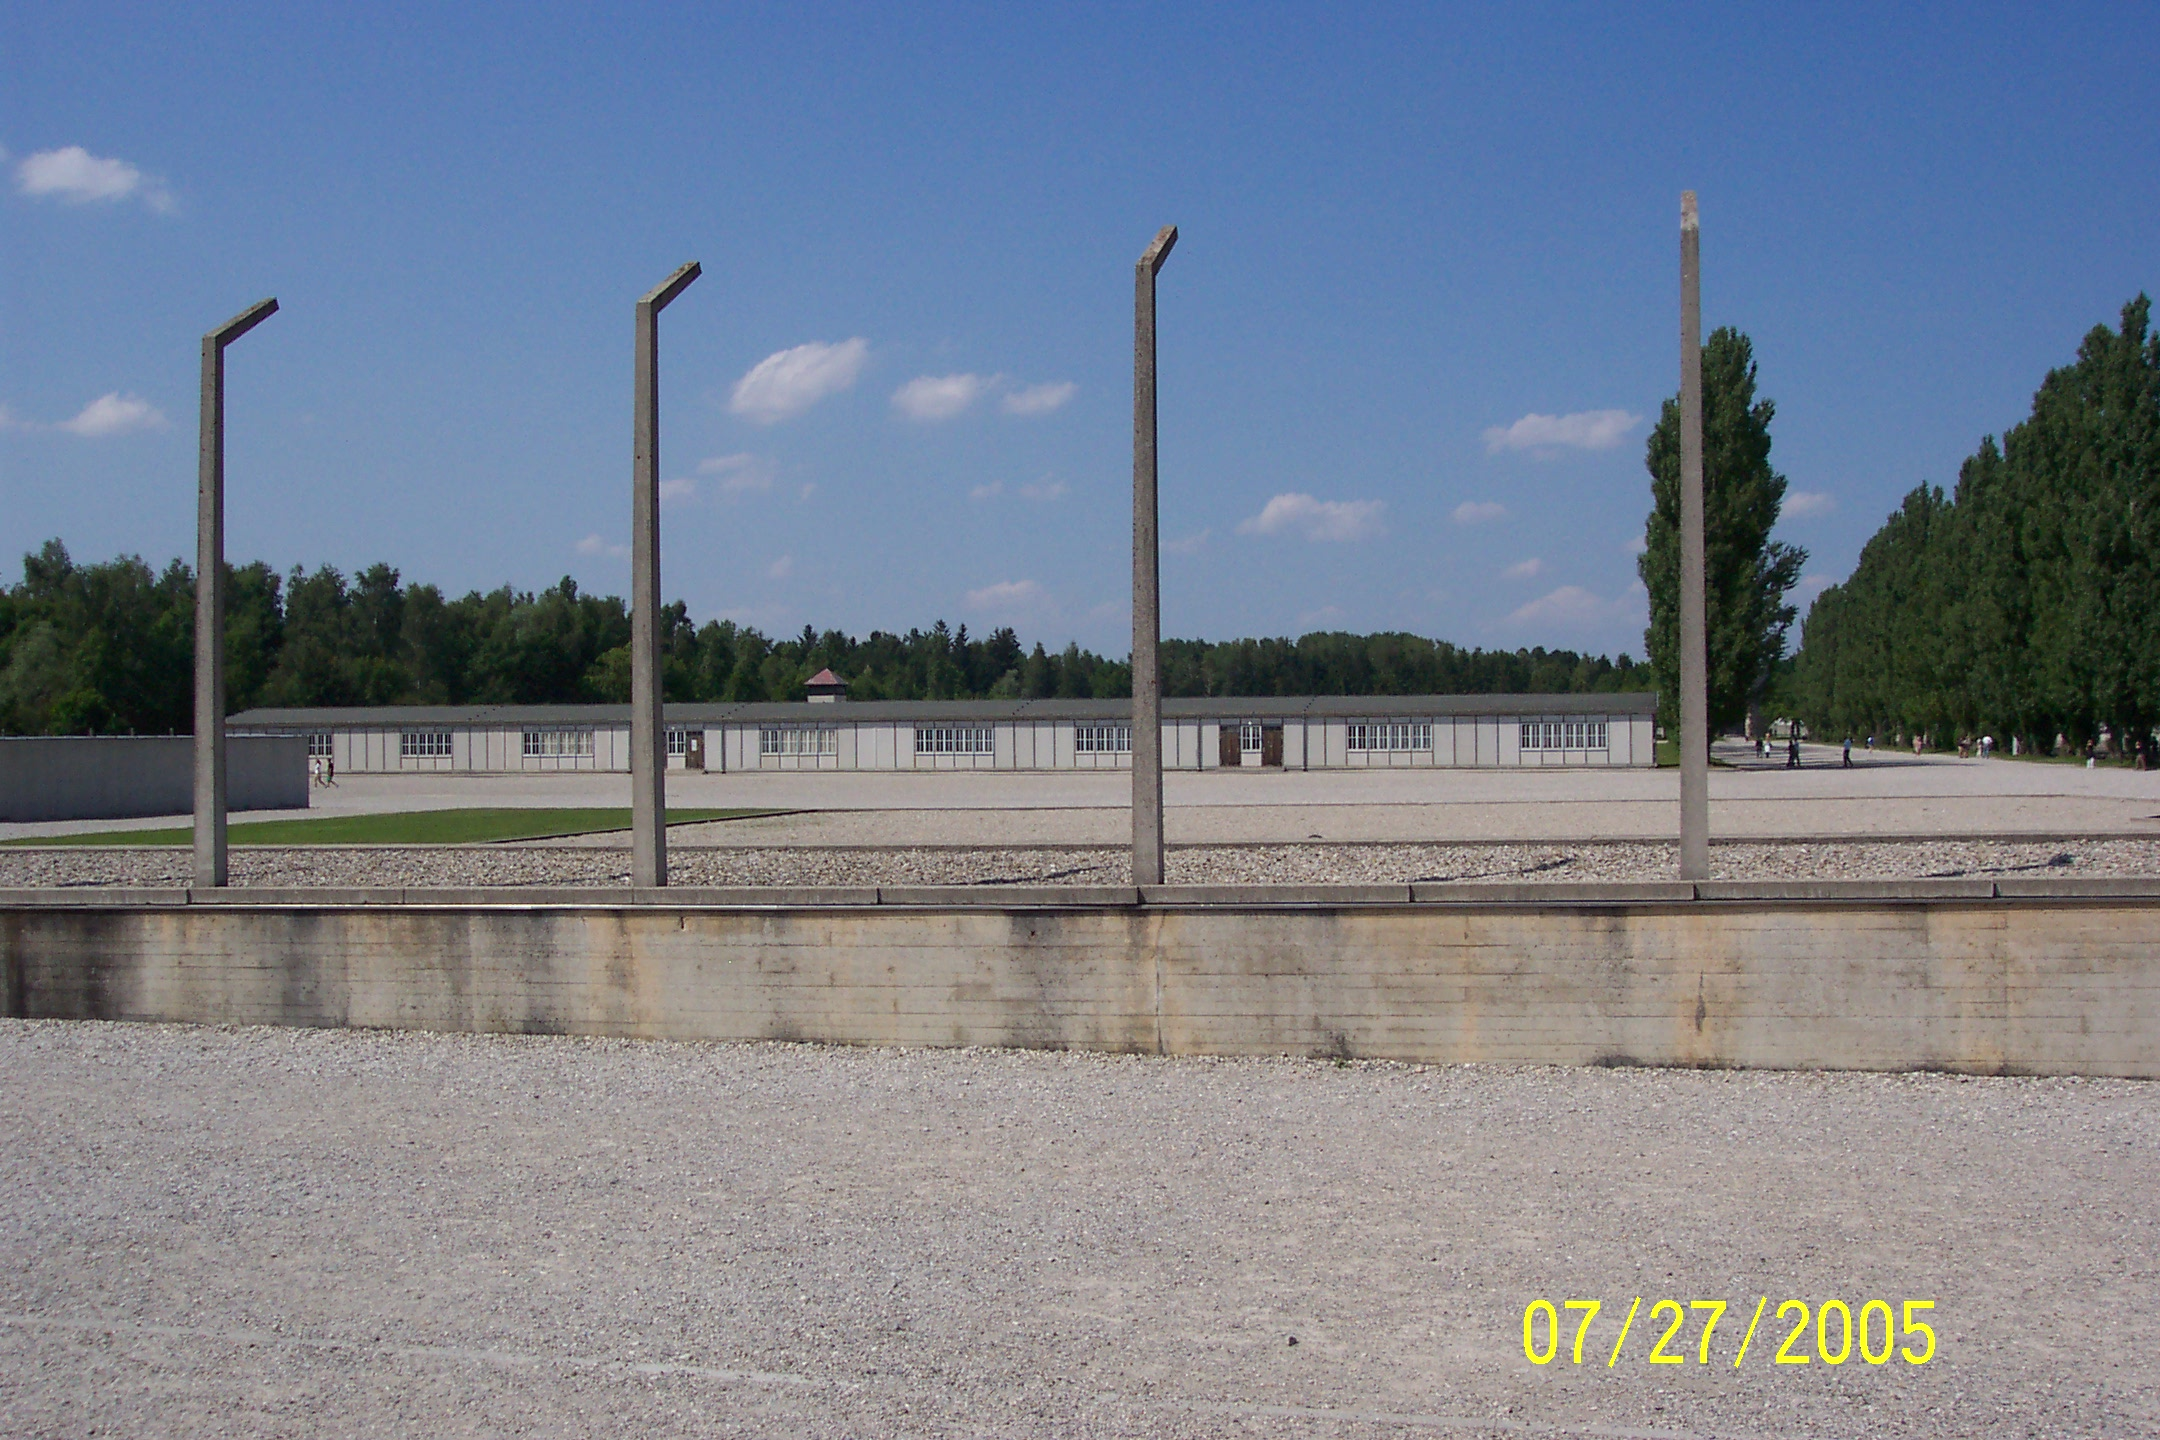 Hell on Earth: Dachau Concentration Camp - Follow the Flammias